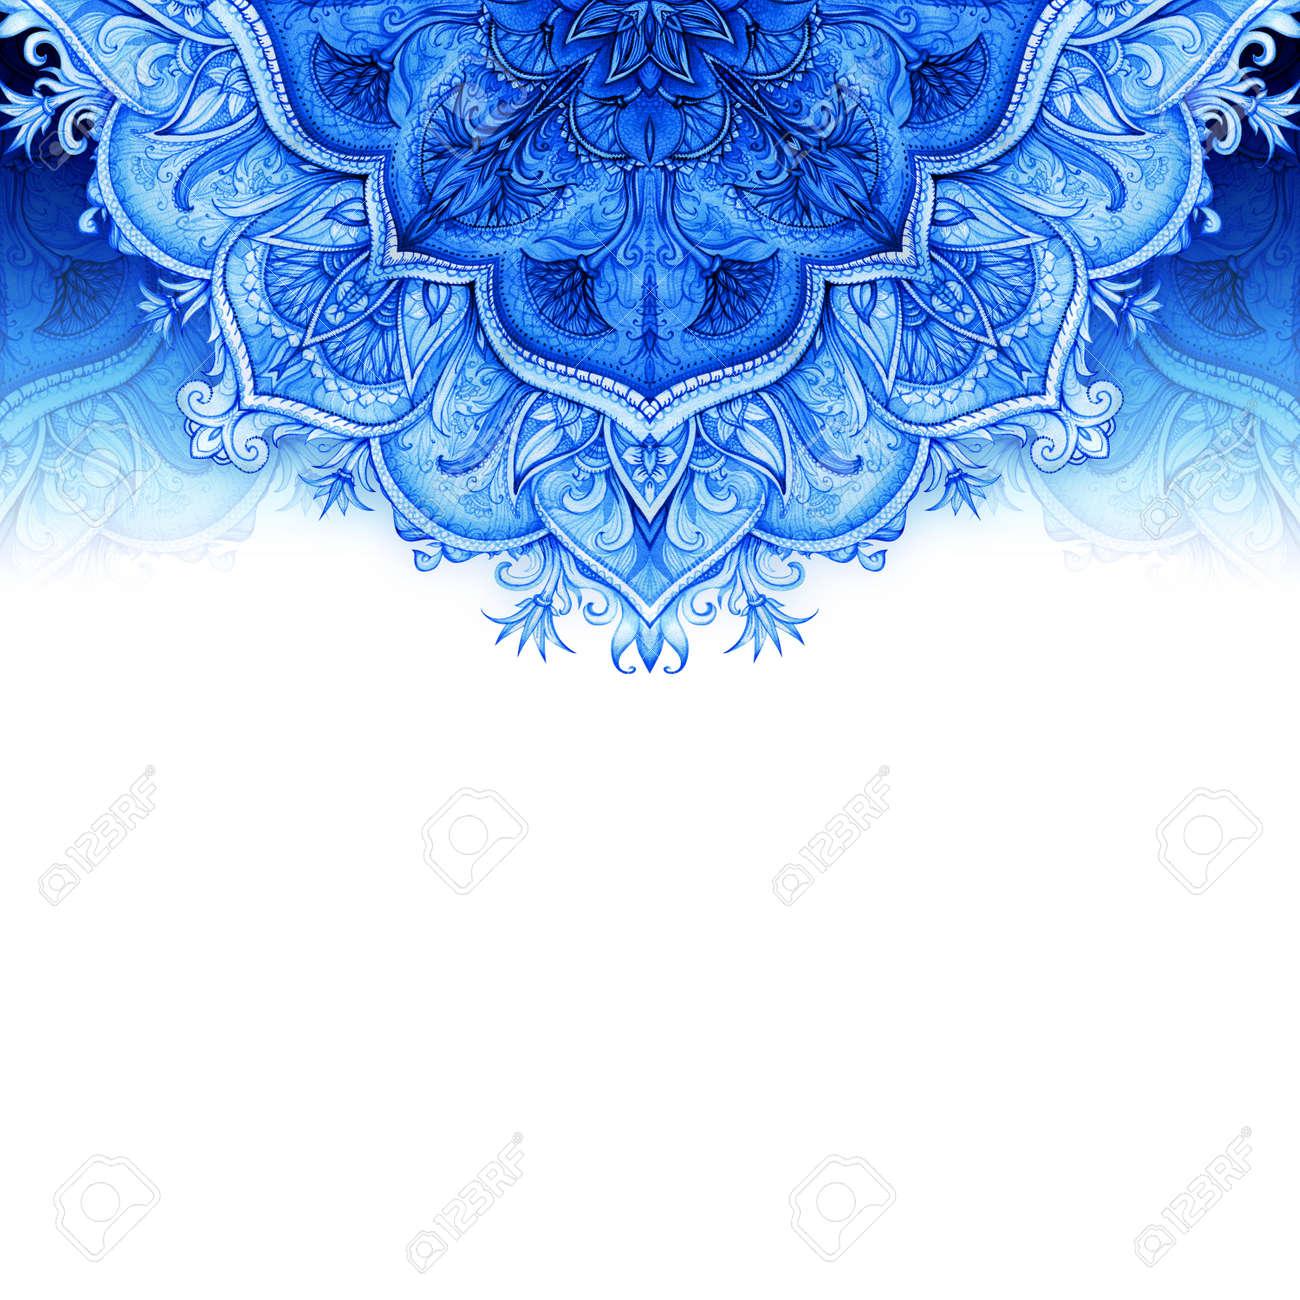 Retro Vintage Wedding Greeting Card Blue Background Or Invitation Decorative Elements Hand Drawn